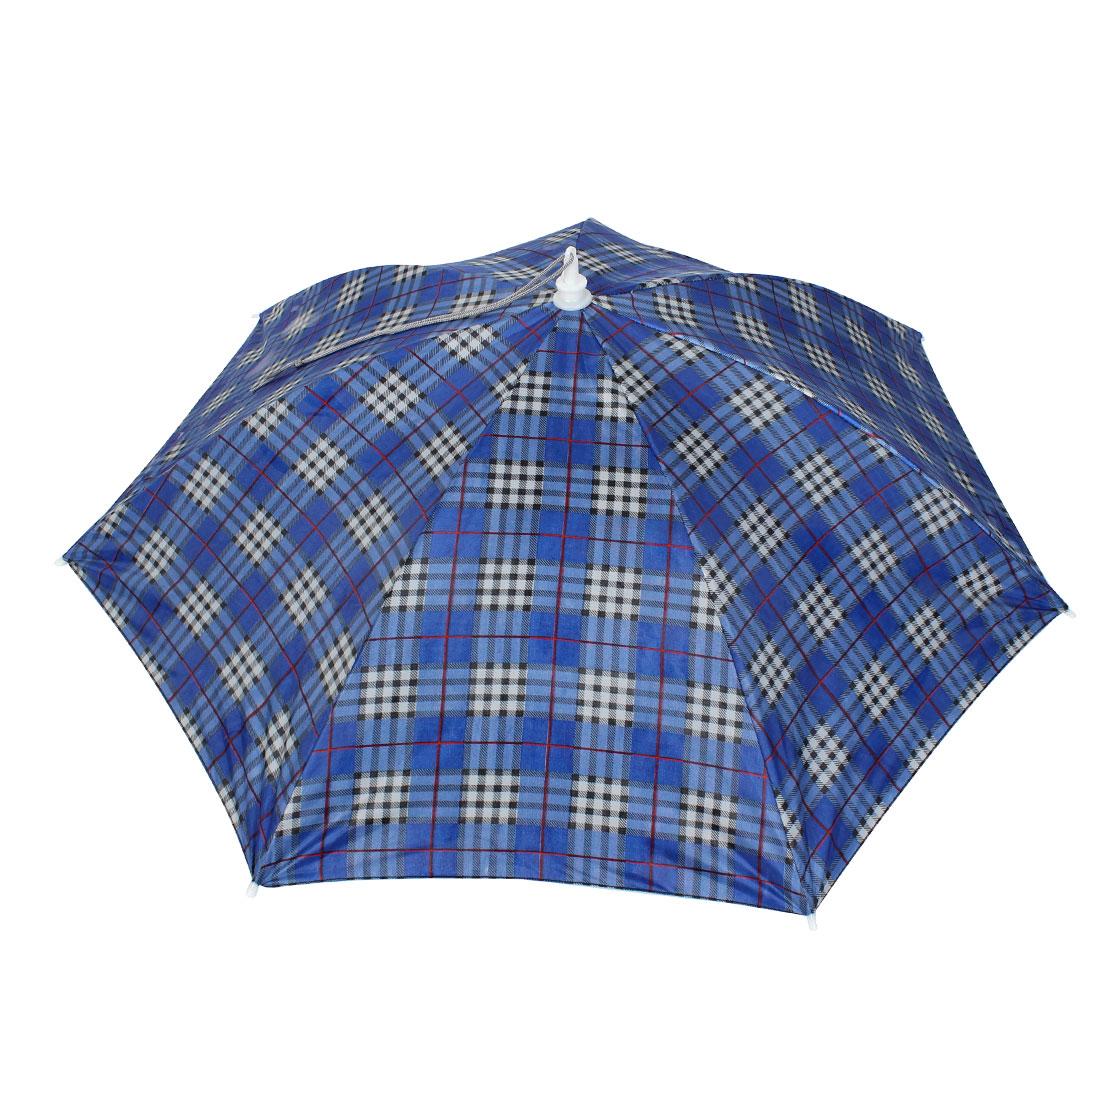 Fisherman Fishing Travel Headwear Elastic Headband Umbrella Hat Cap